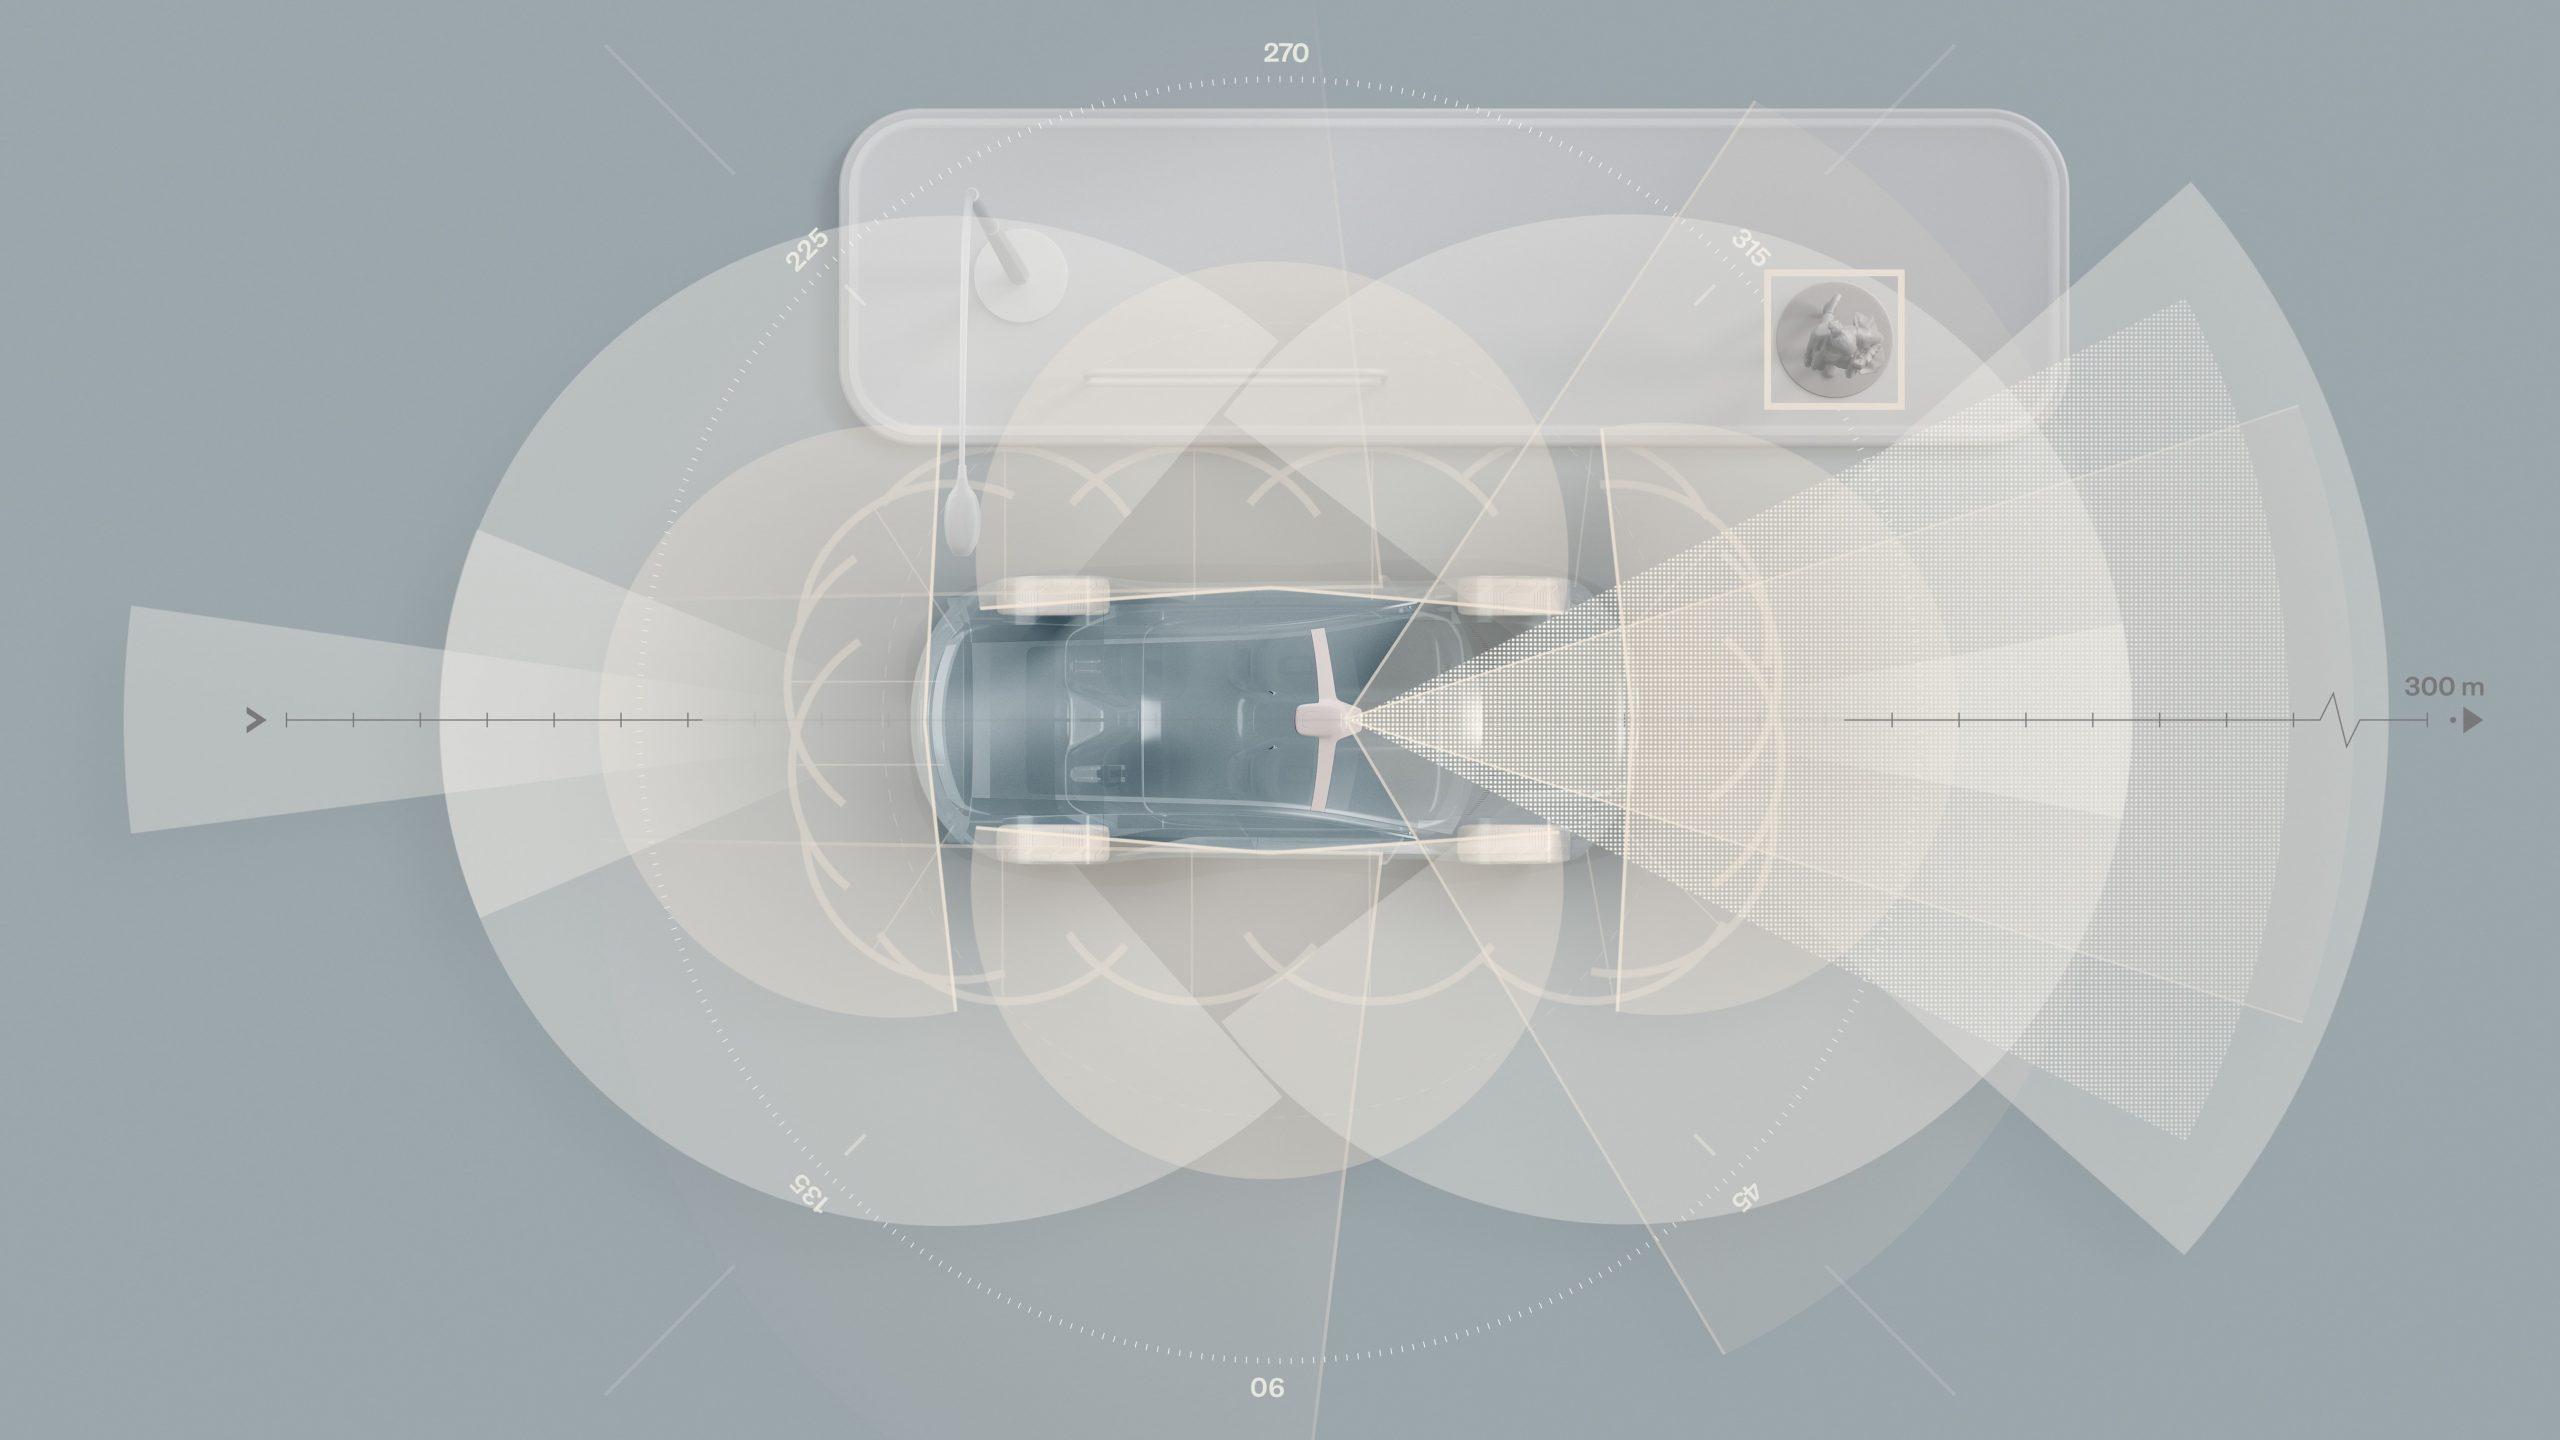 283467 Sensors on electric successor to XC90 Complete sensor set scaled Το επόμενο Volvo EV θα διαθέτει υπερυπολογιστή τεχνητής νοημοσύνης! electric vehicles, EV, Volvo, Volvo Cars, ειδήσεις, Νέα